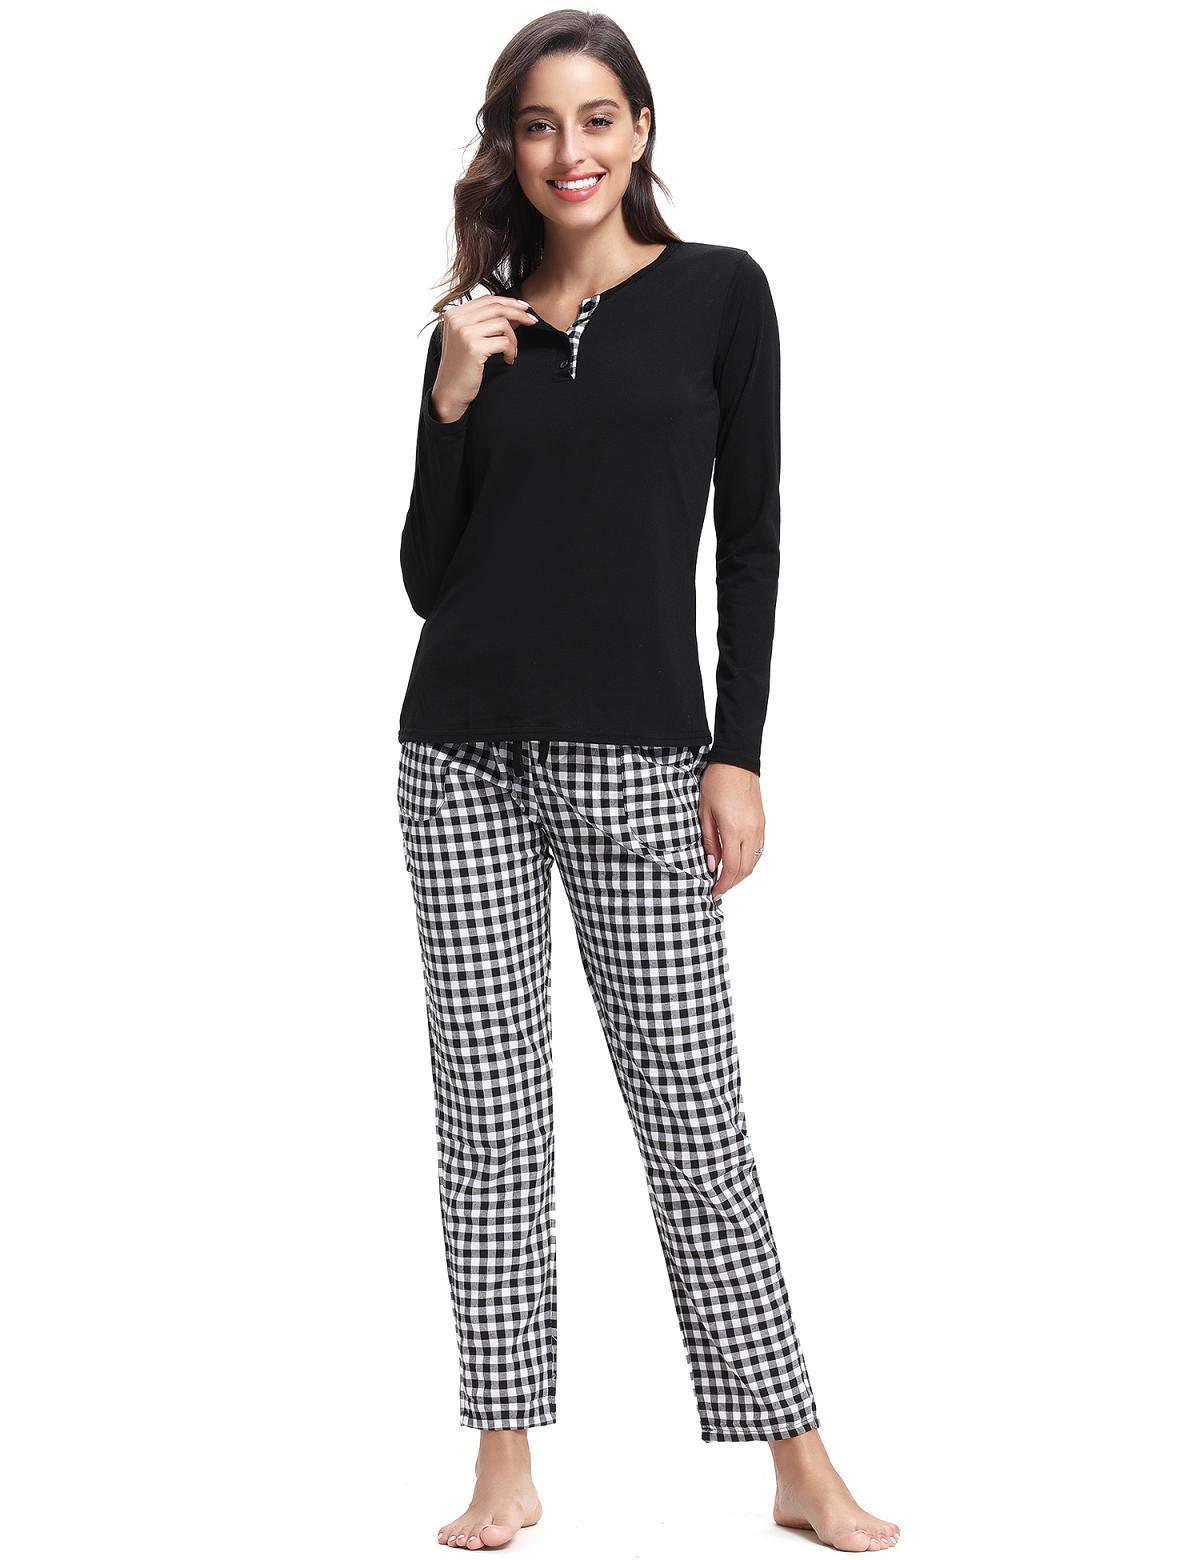 8e7ba422e5 Abollria Pijamas Mujer Algodon Ropa de Domir Elegante Manga Pantalon Largos  product image